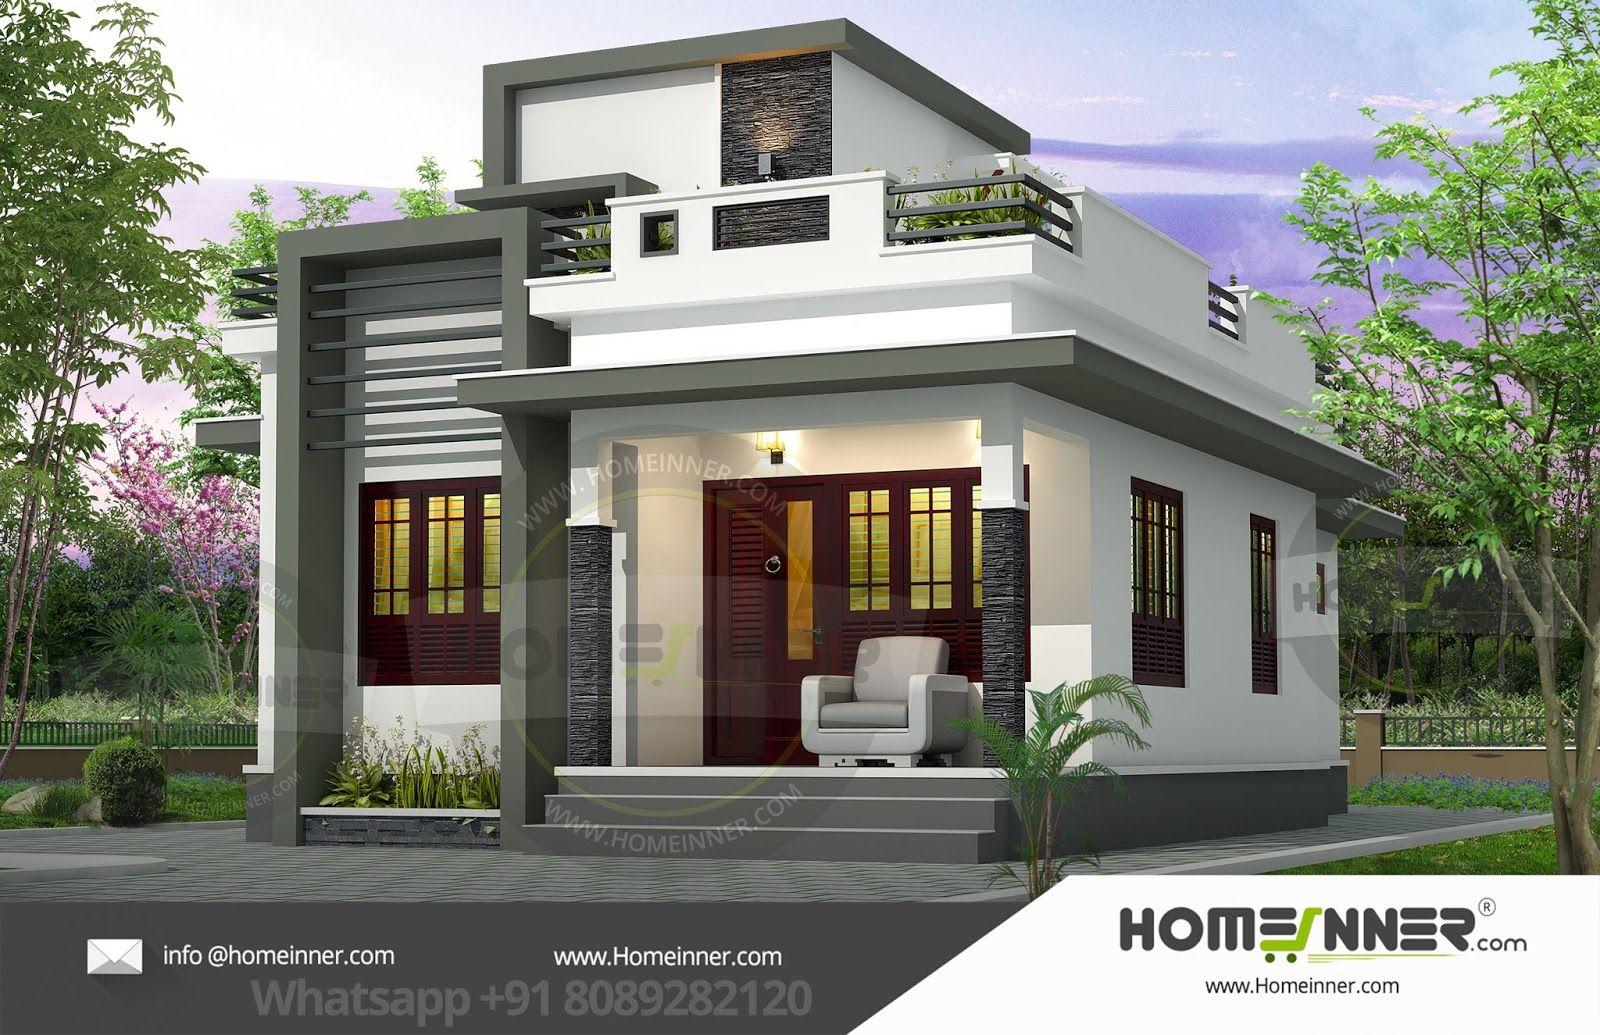 12 Lakh 2 Bhk 1033 Sq Ft Allahabad Villa Floor Plan Kerala House Design Small House Design Plans Small House Elevation Design